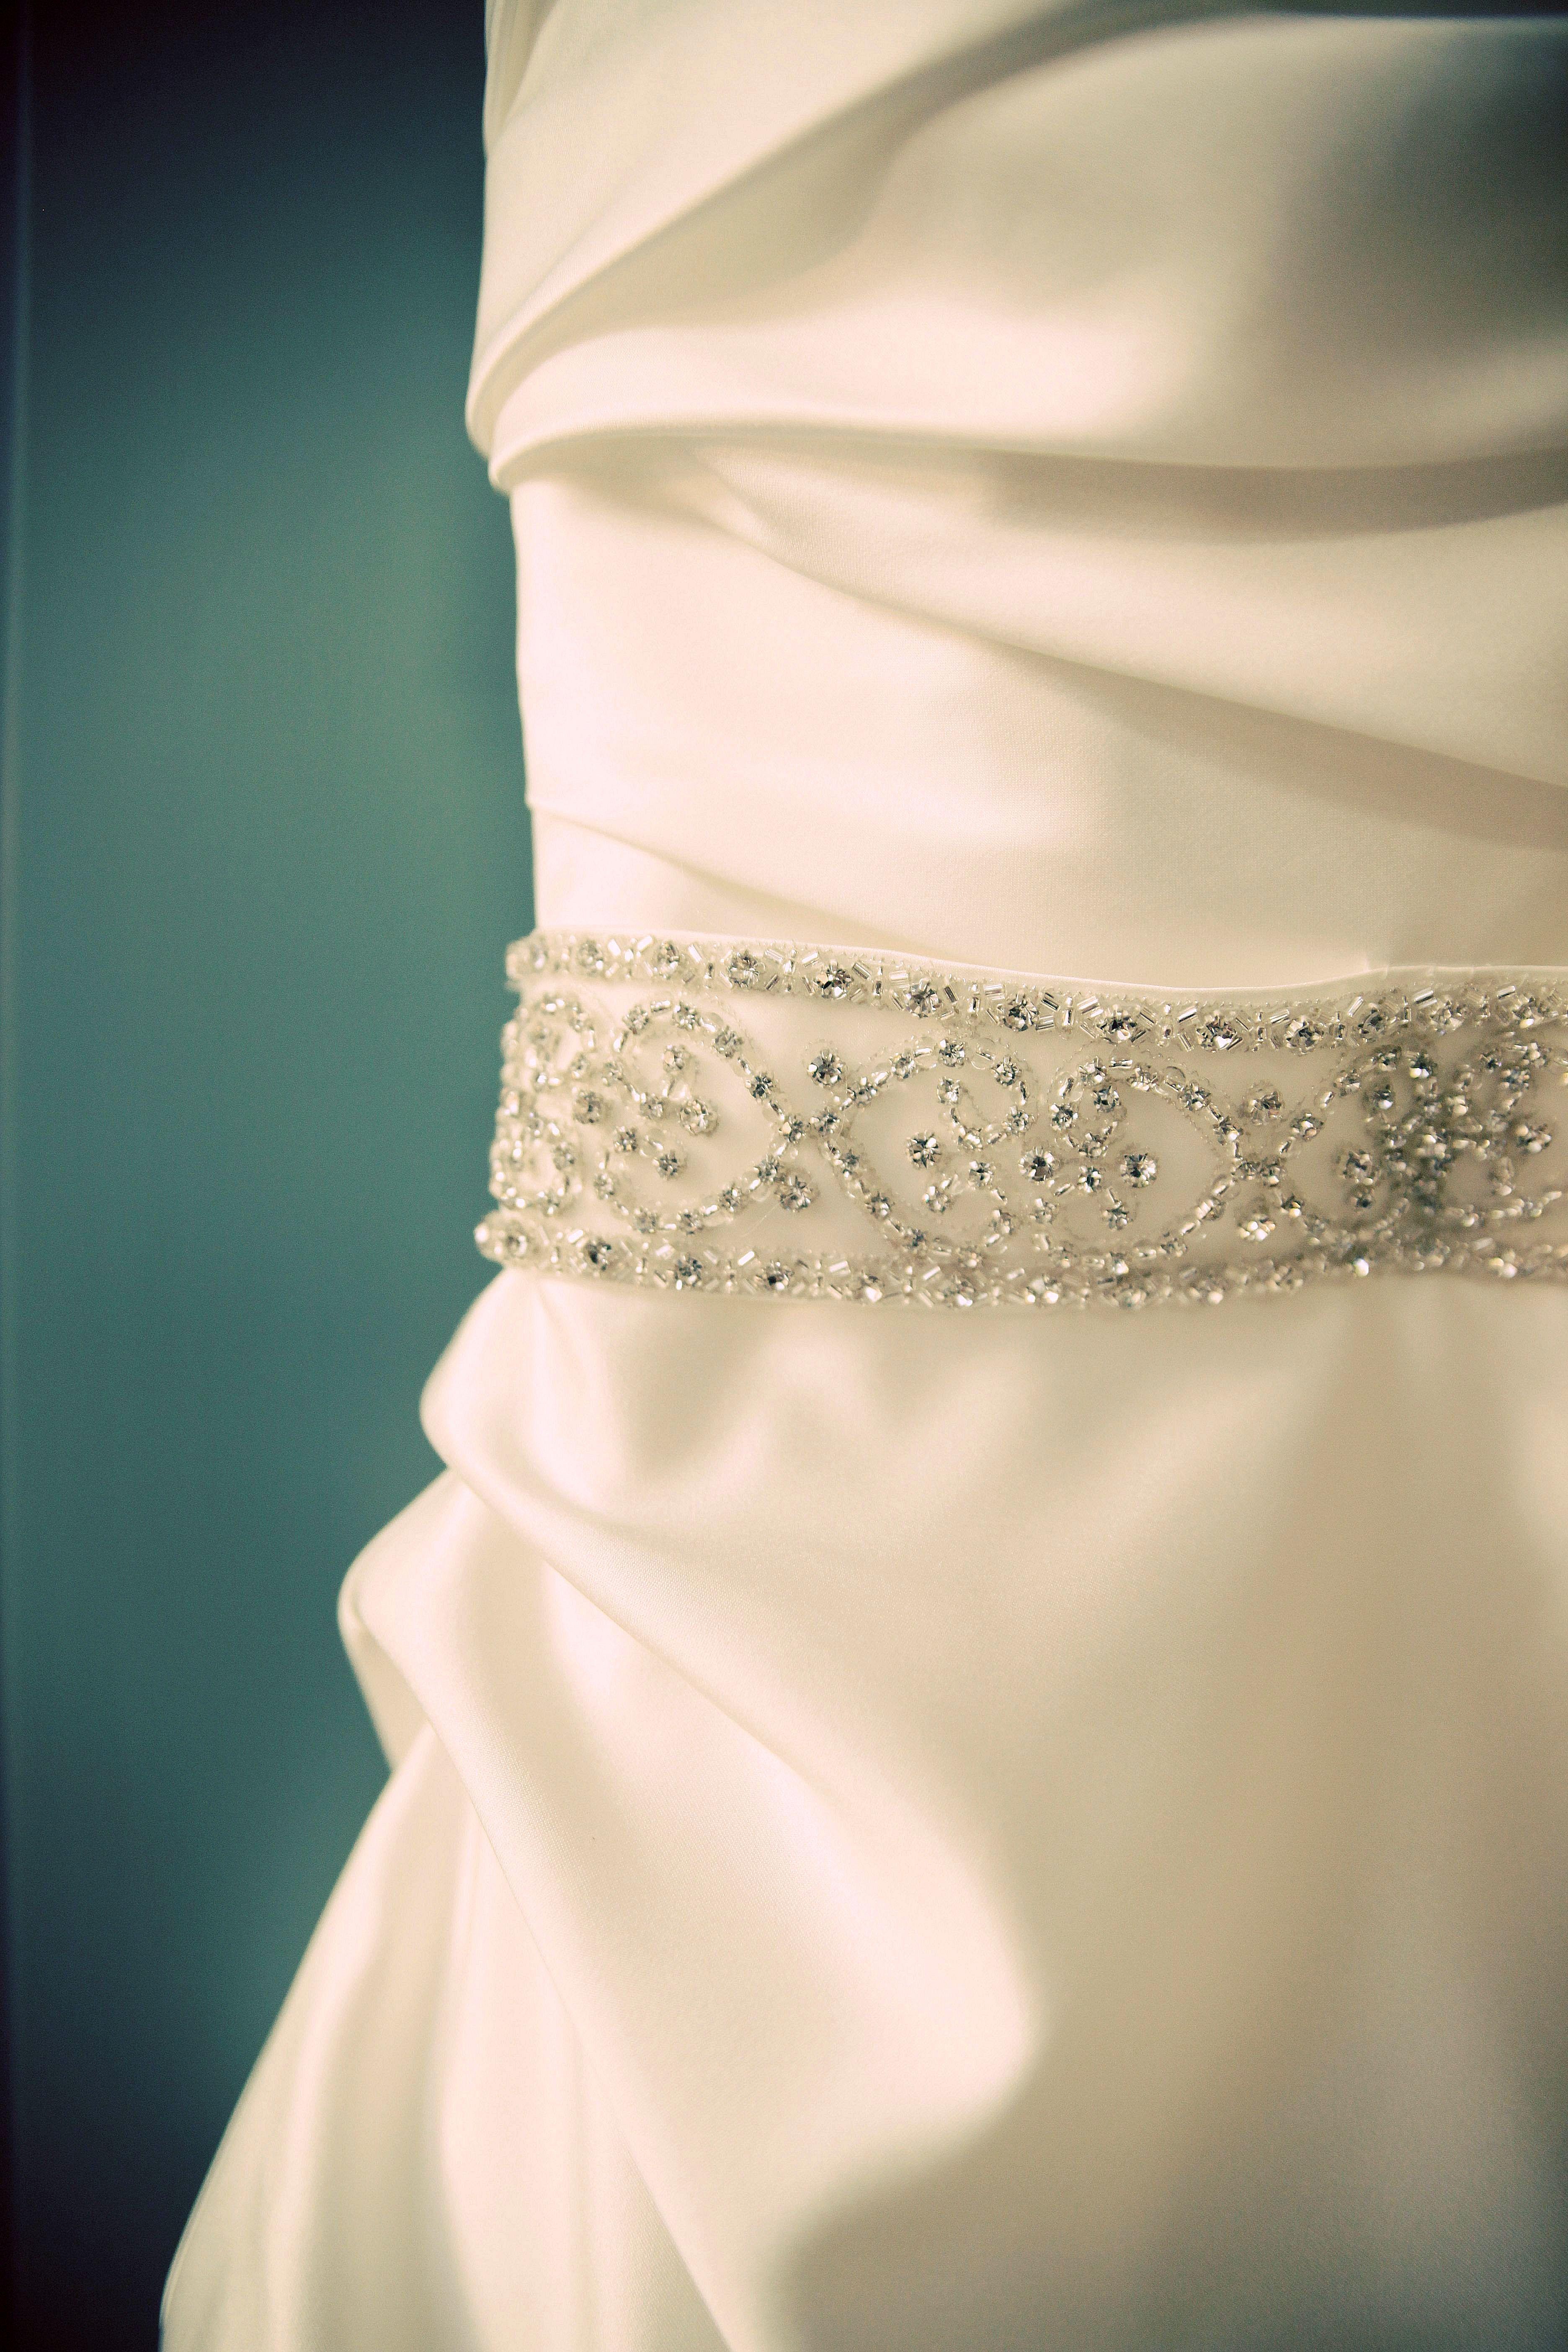 Frame your Wedding Dress | Our Front Door Looking in...